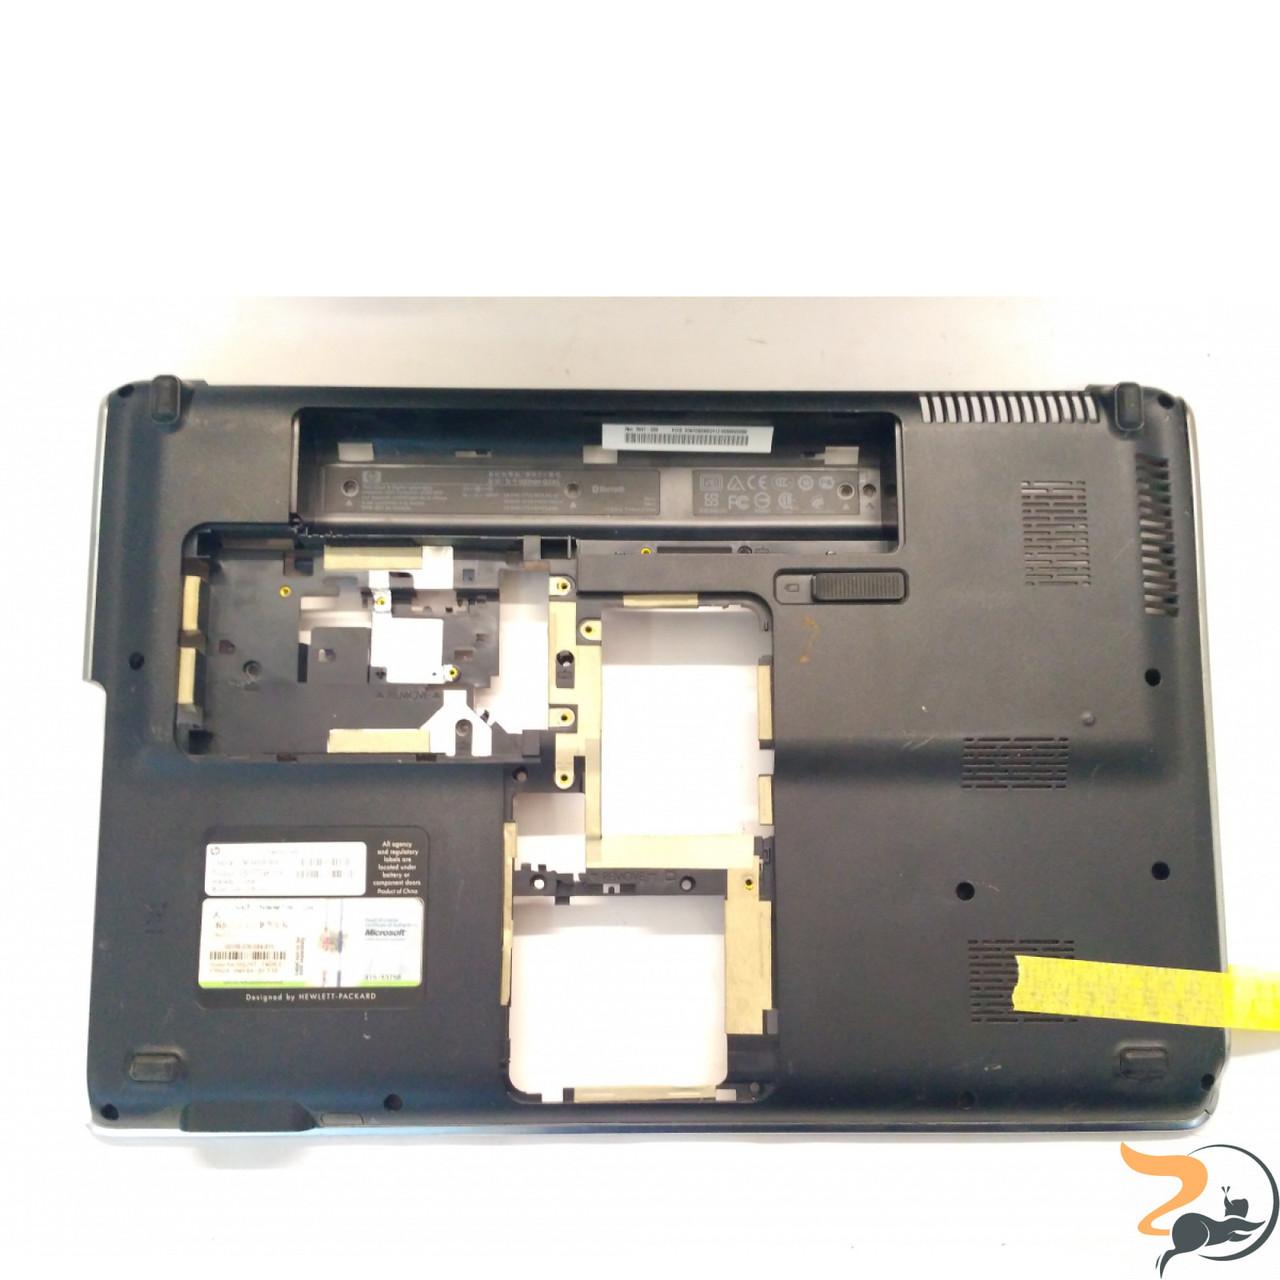 "Нижня частина корпуса для ноутбука HP Pavilion dv6-2057eo, 15.6"", 532737-001, Б/В"